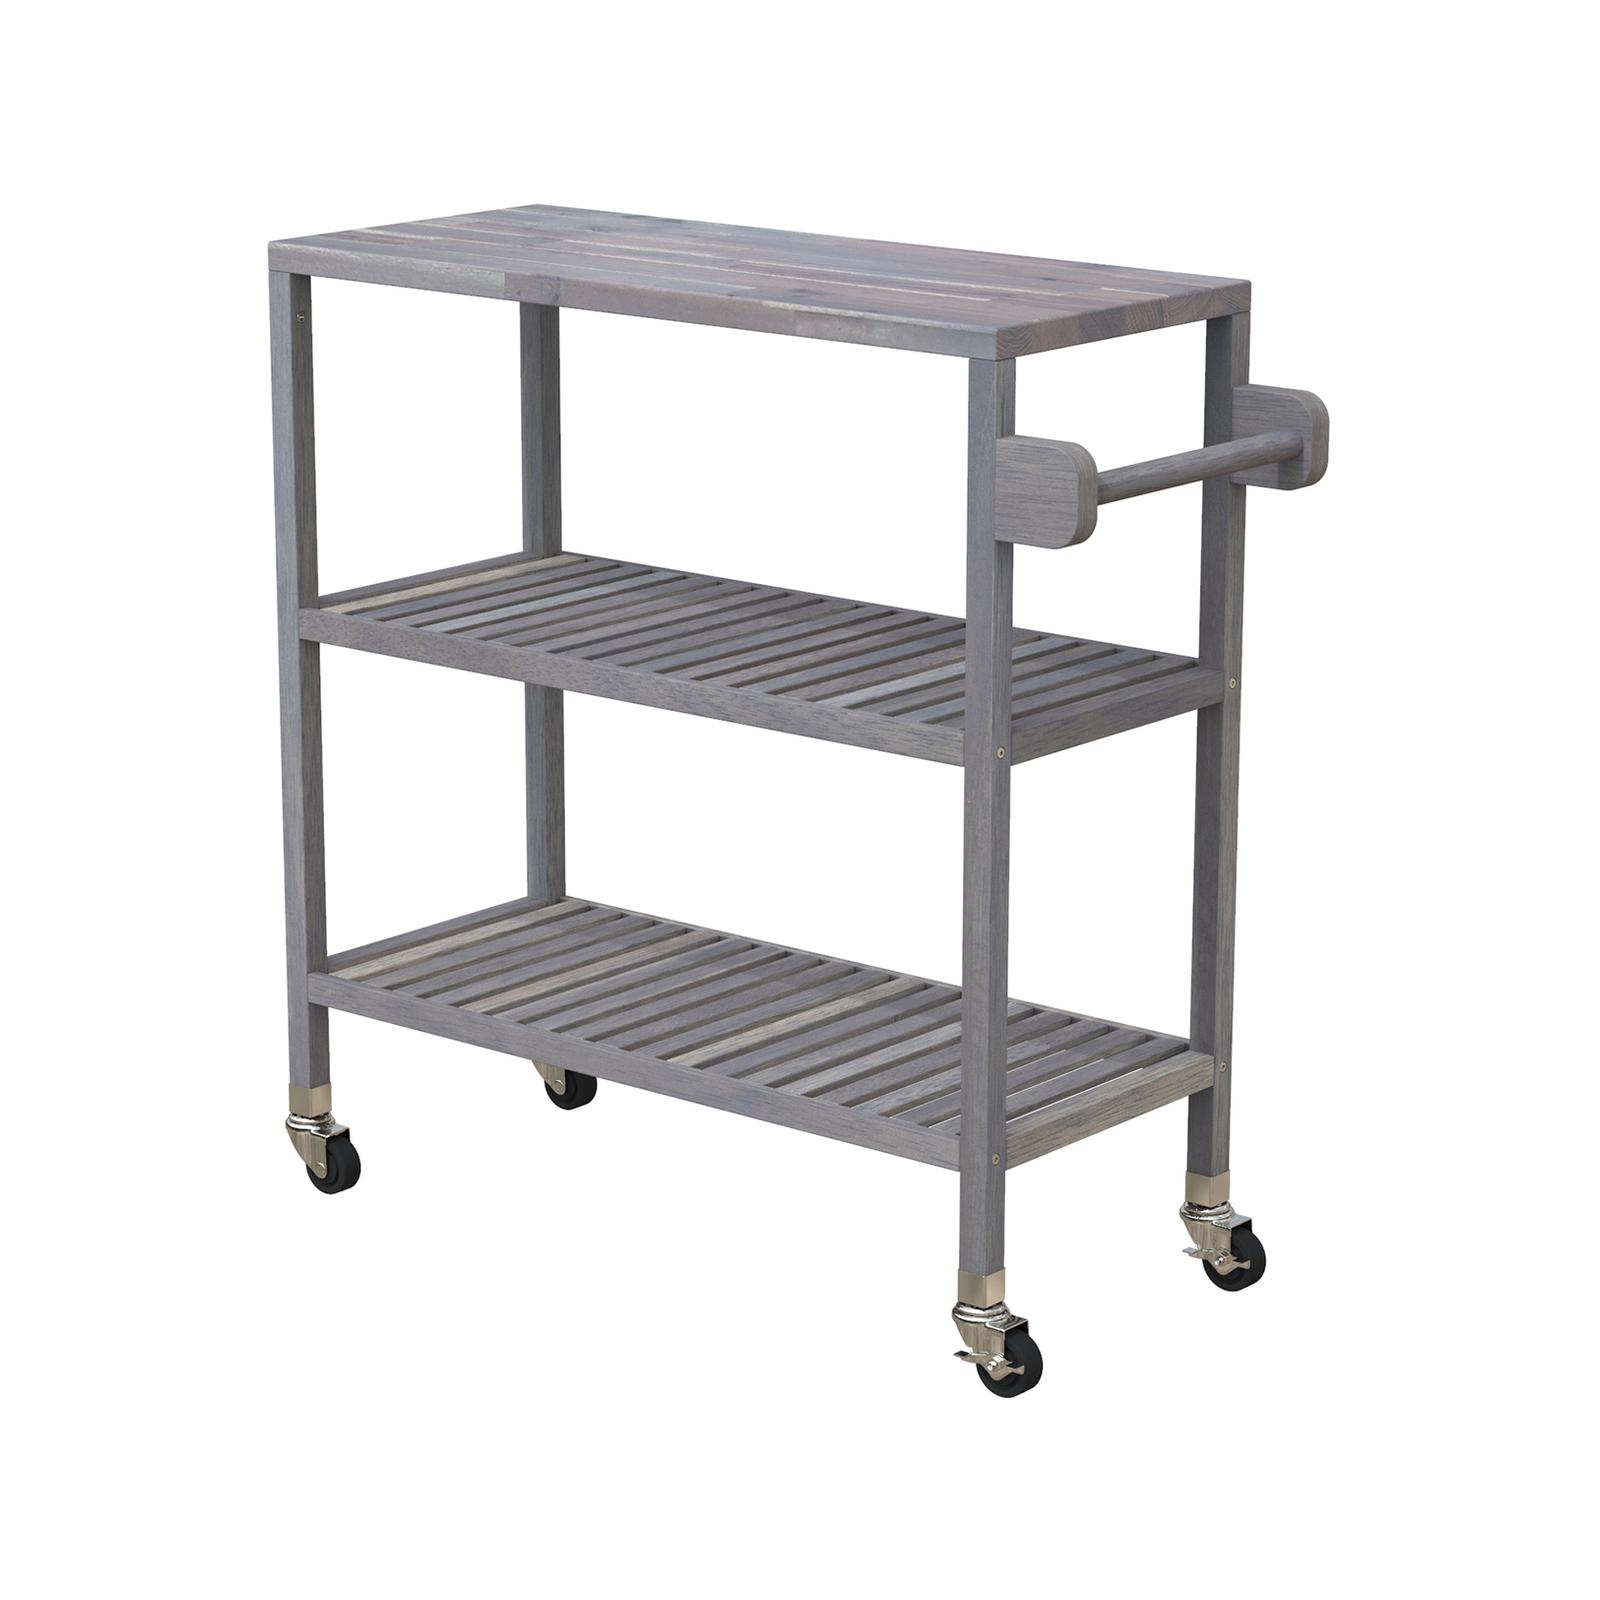 Interbuild 80 x 35 x 85cm Dusk Grey Holger Turbo Kitchen Cart